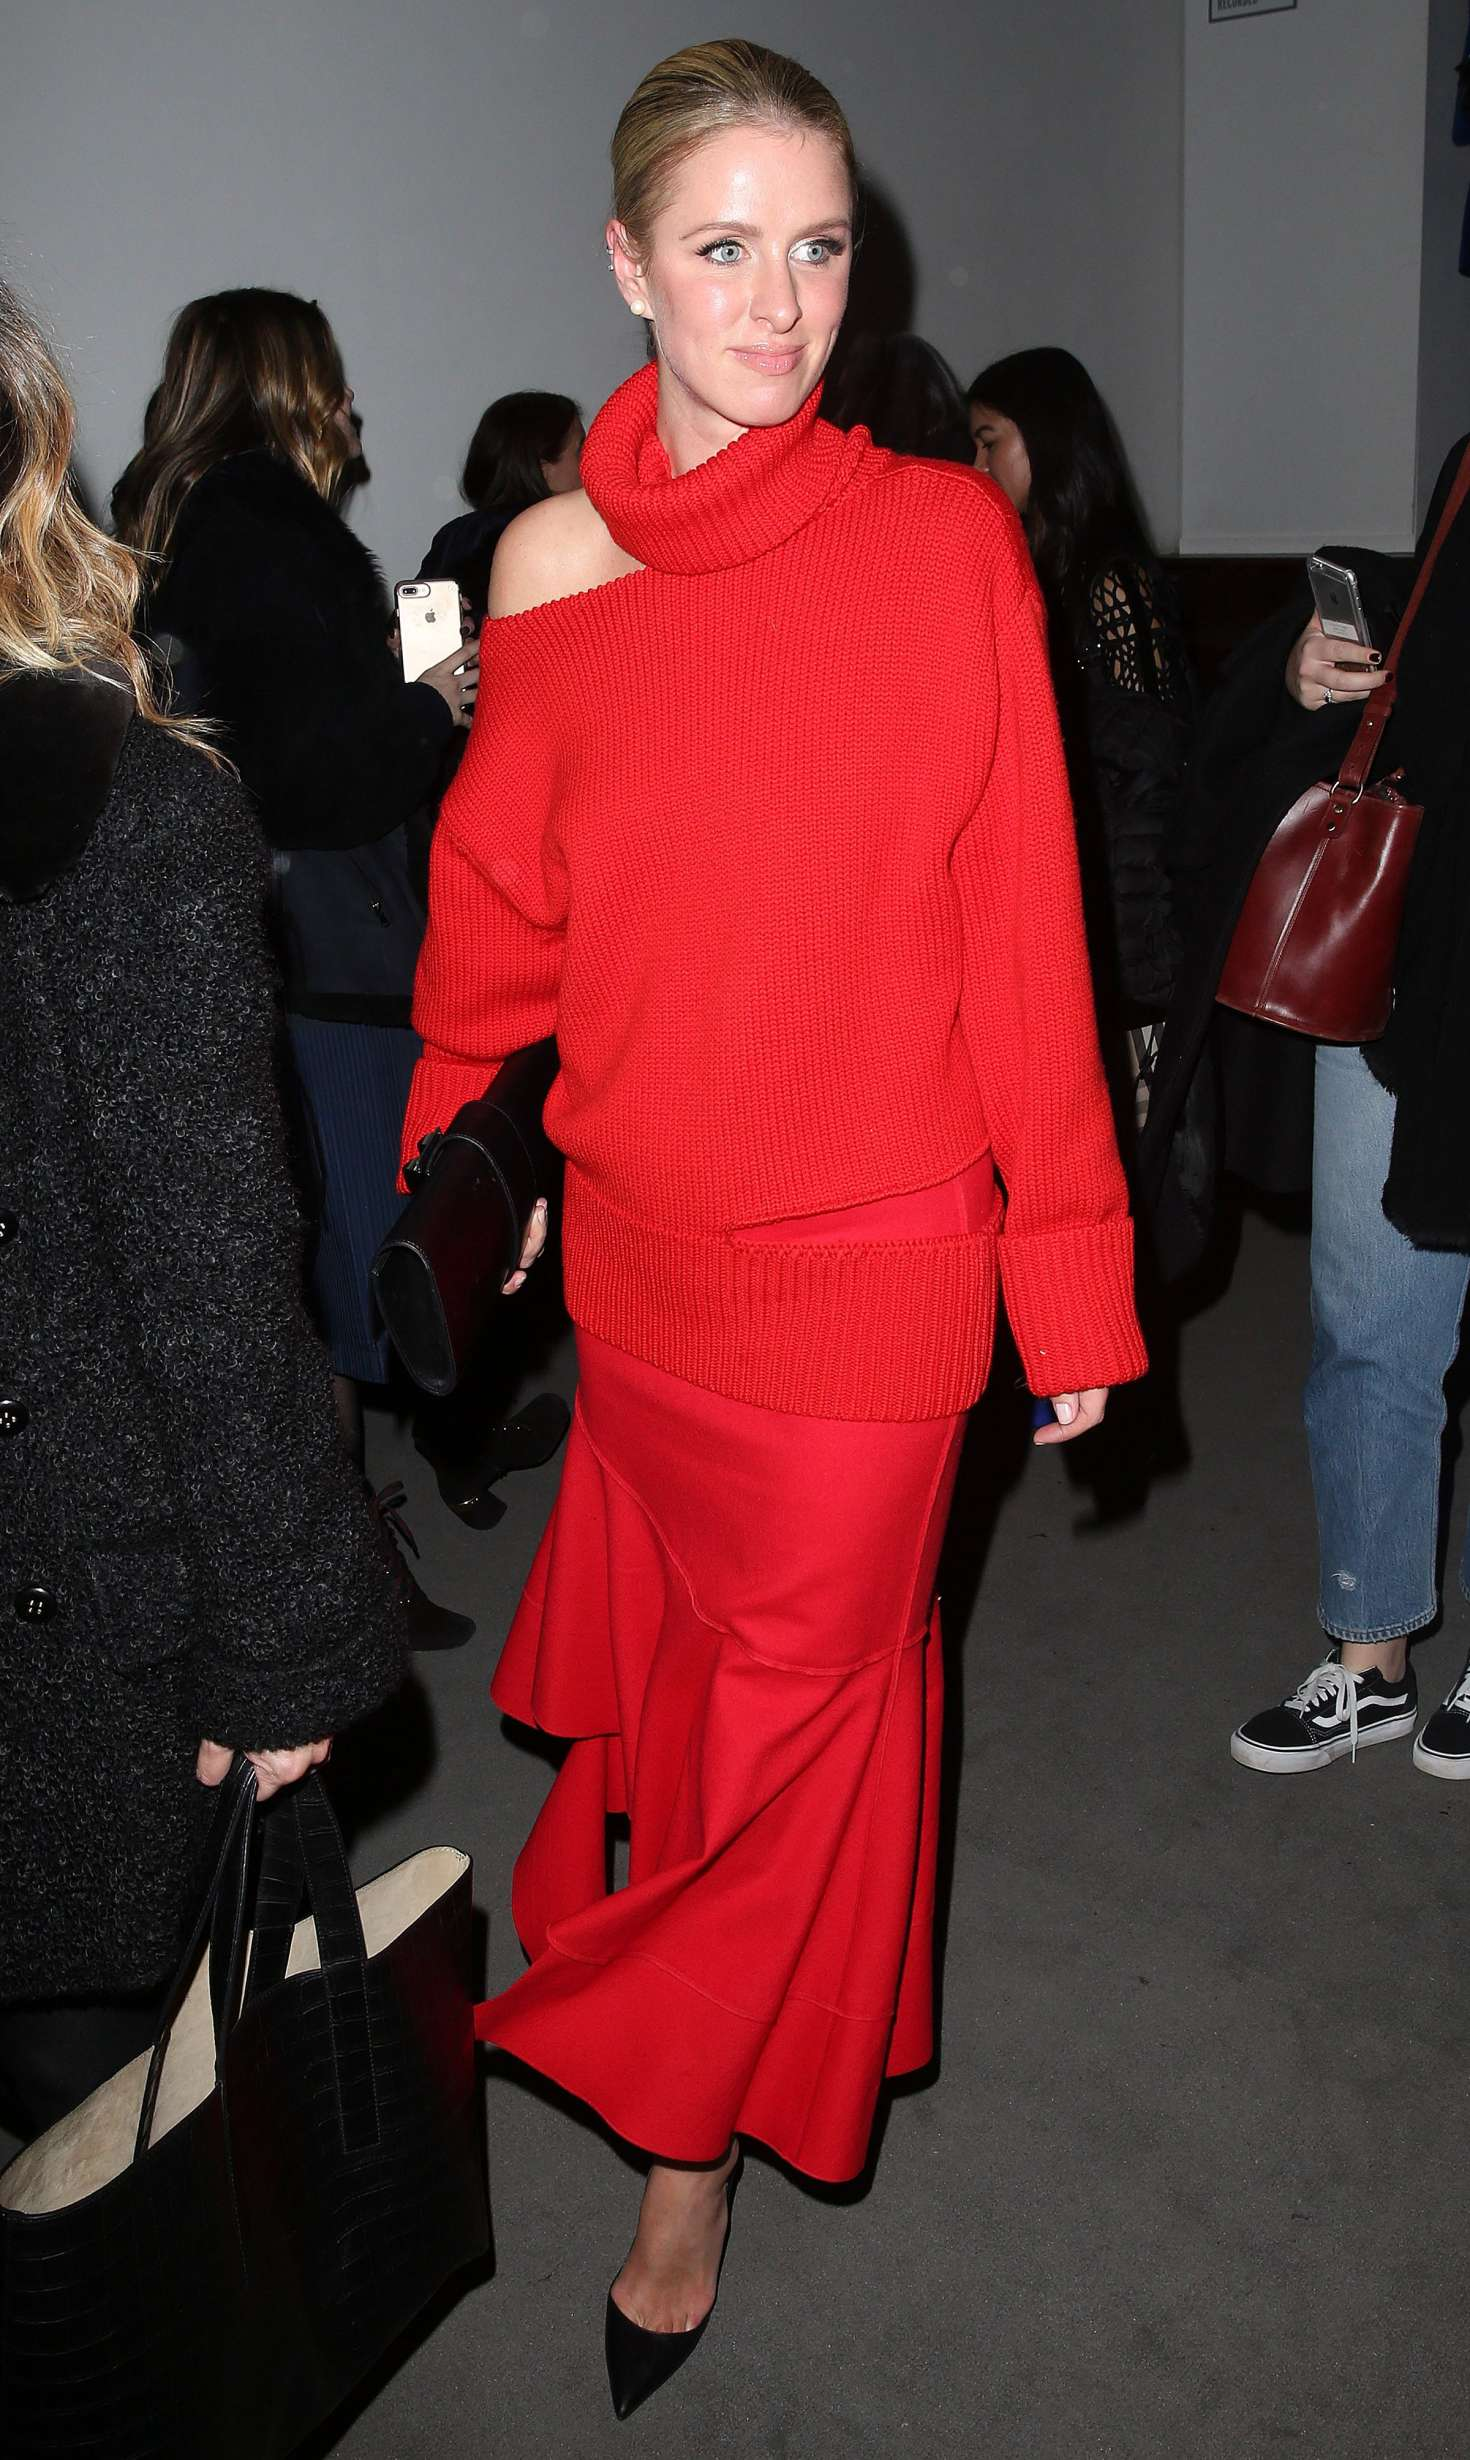 Nicky Hilton - Oscar De La Renta Show at 2017 NYFW in New York